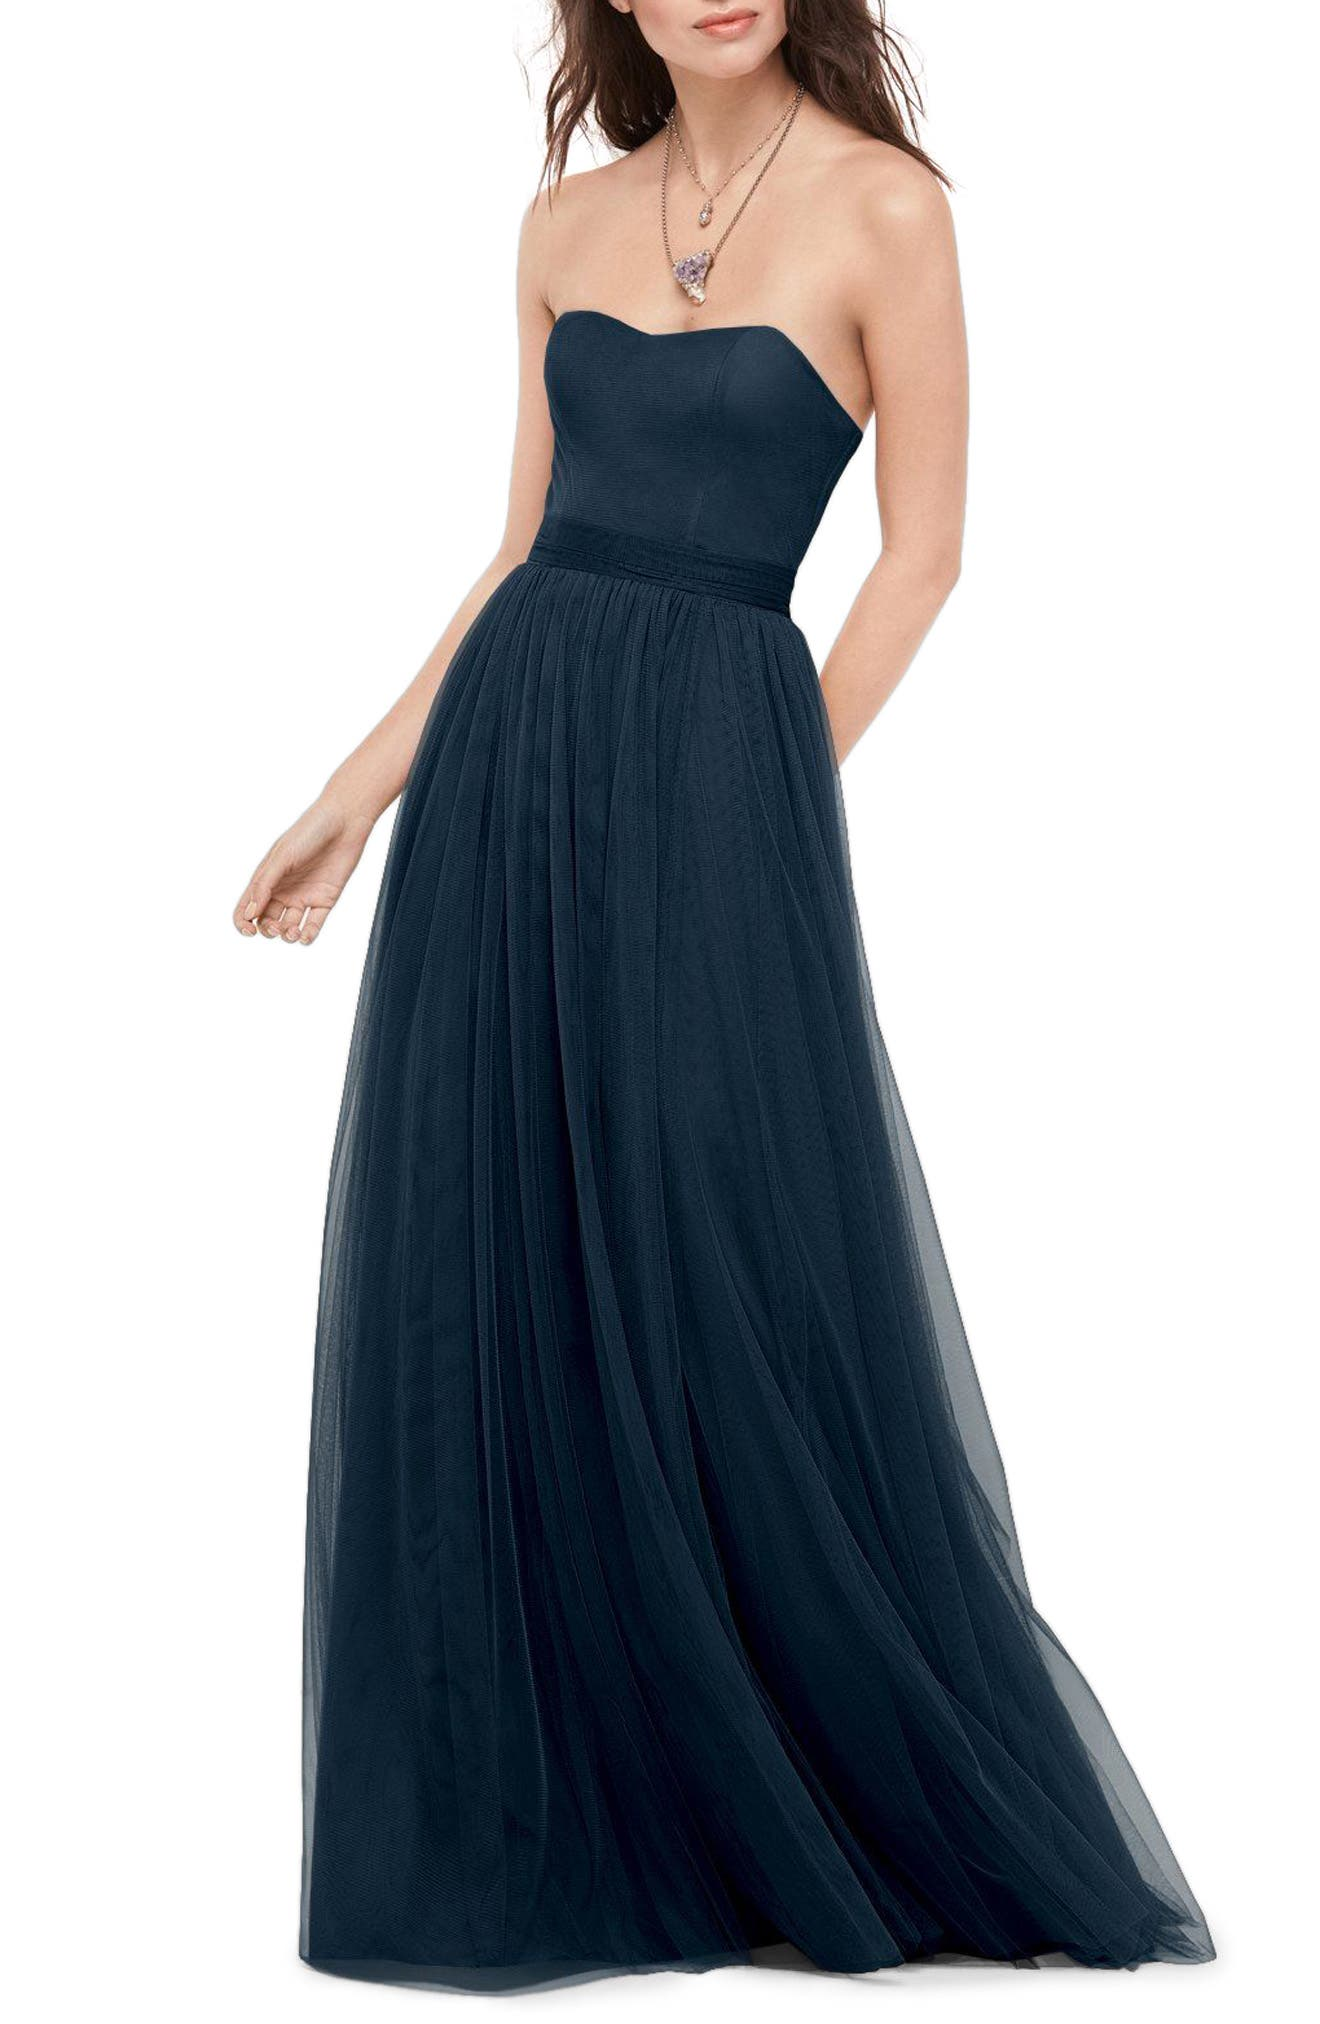 Bobbinet Strapless Gown,                             Main thumbnail 1, color,                             Indigo